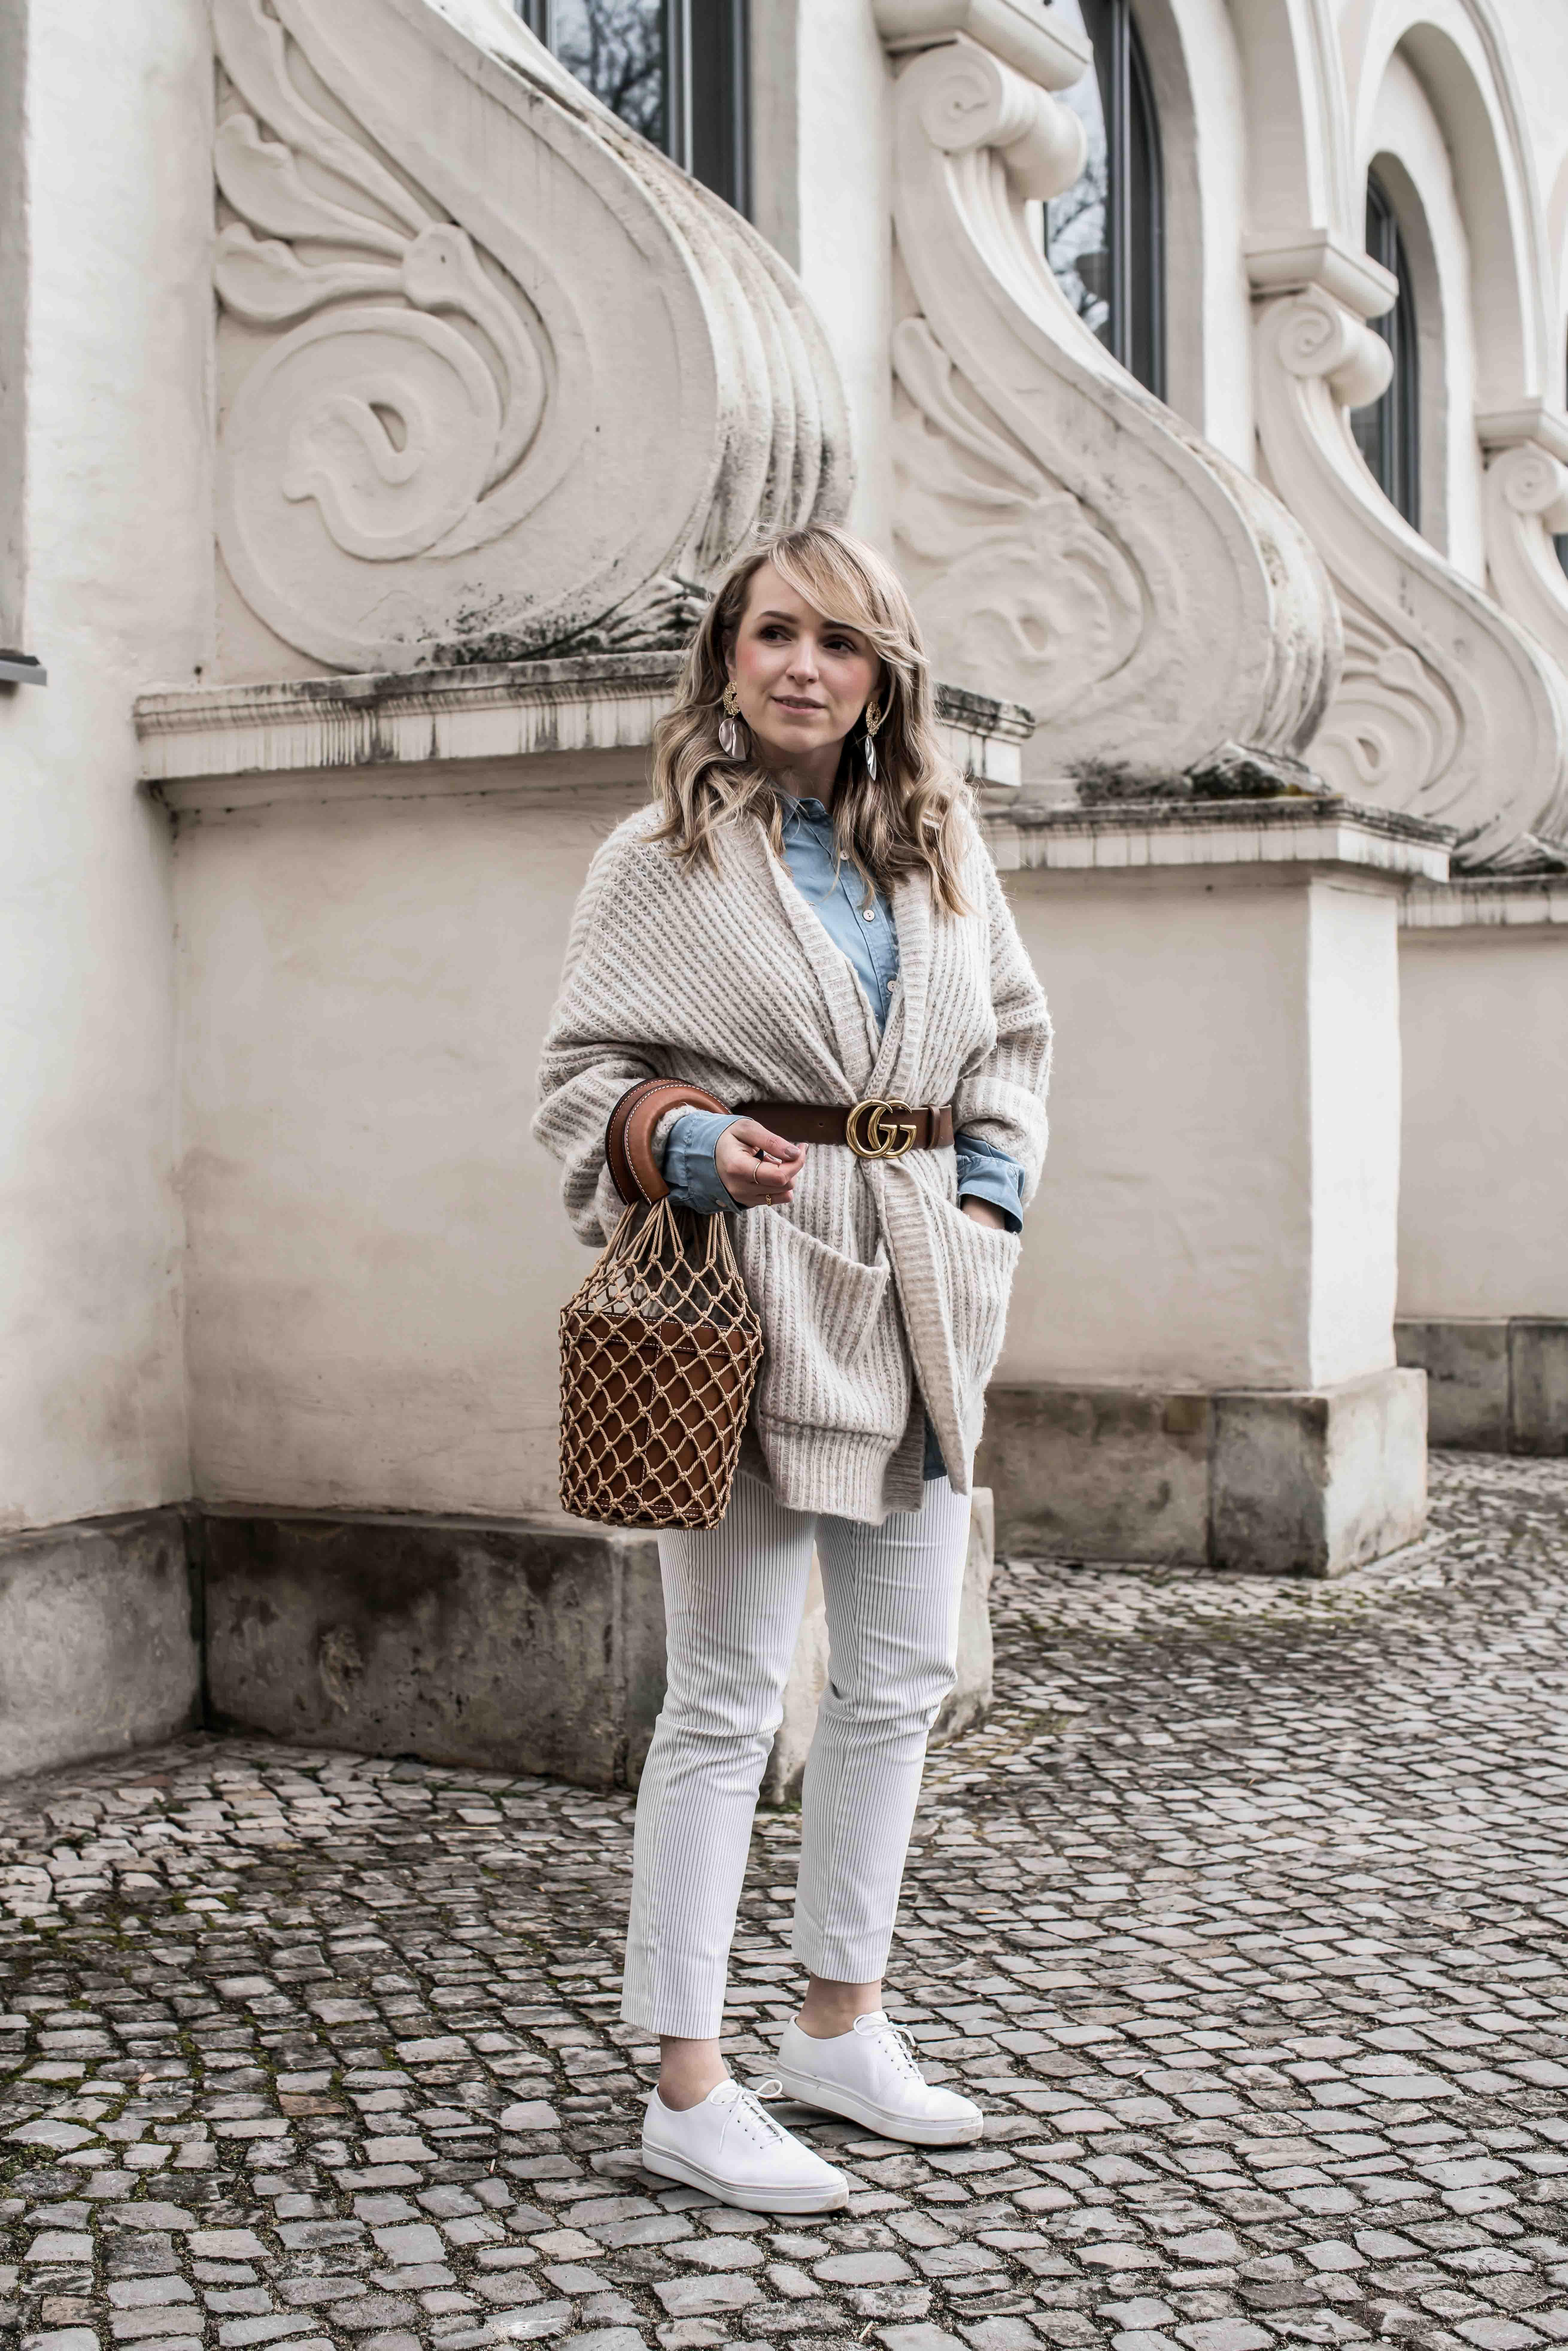 Family First Hundemom ootd: Gucci meets zara knitwear